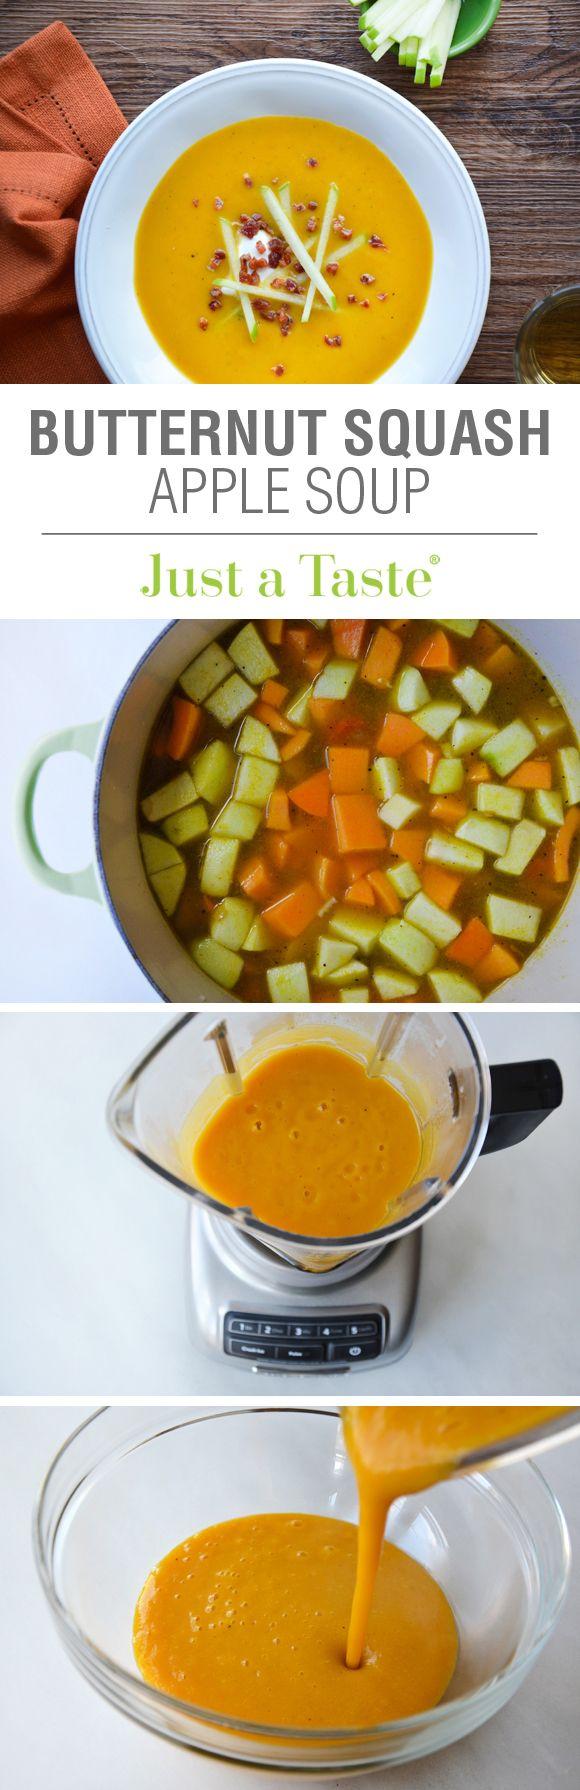 Butternut Squash Apple Soup recipe via justataste.com | A creamy, yet cream-less quick and easy soup!